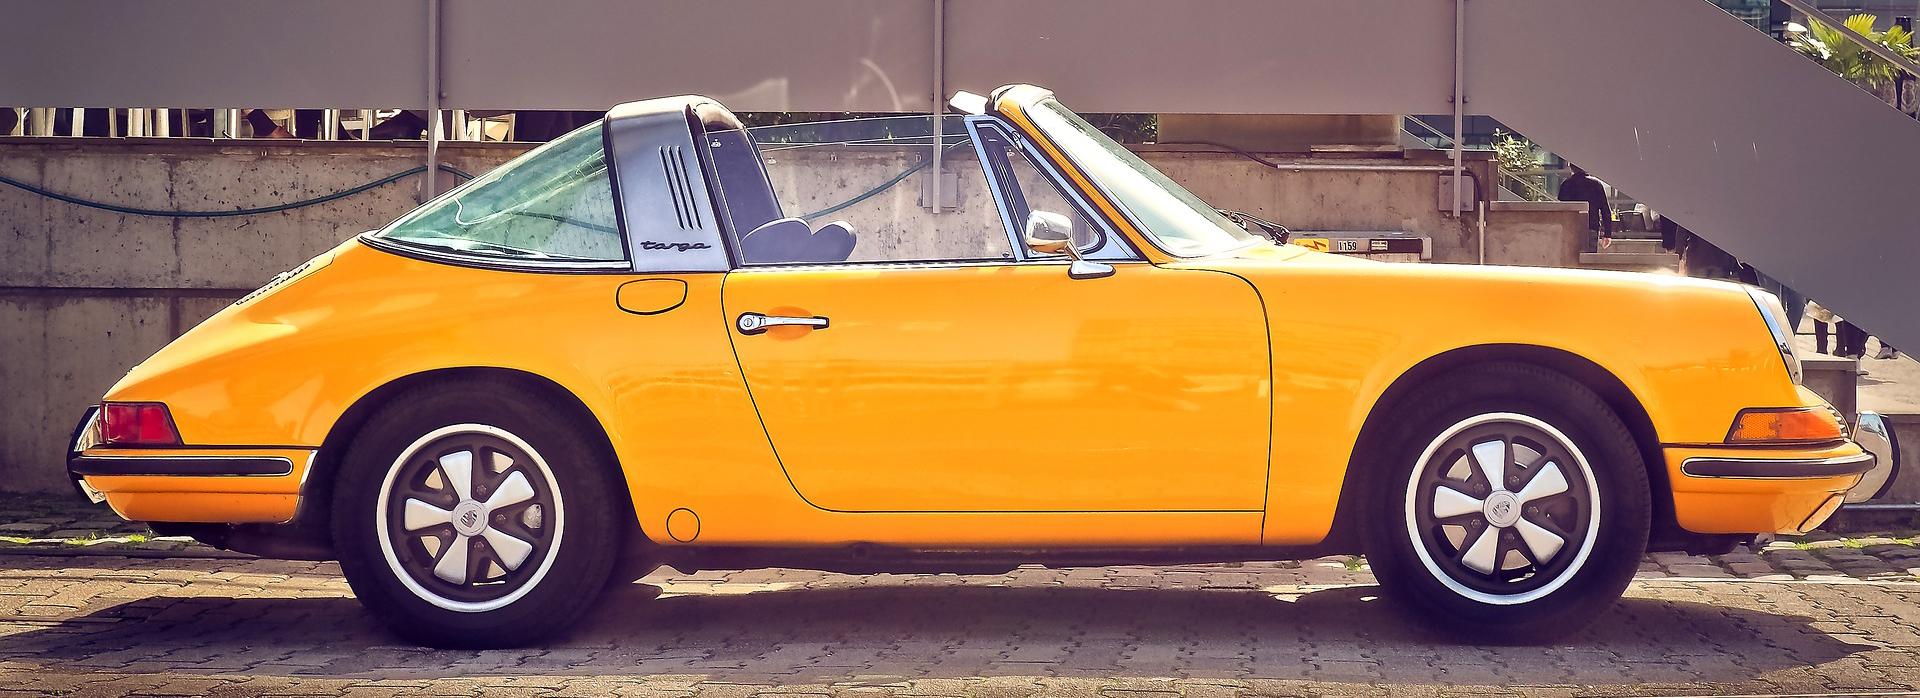 Yellow Oldtimer Car in San Bruno, California | Breast Cancer Car Donations